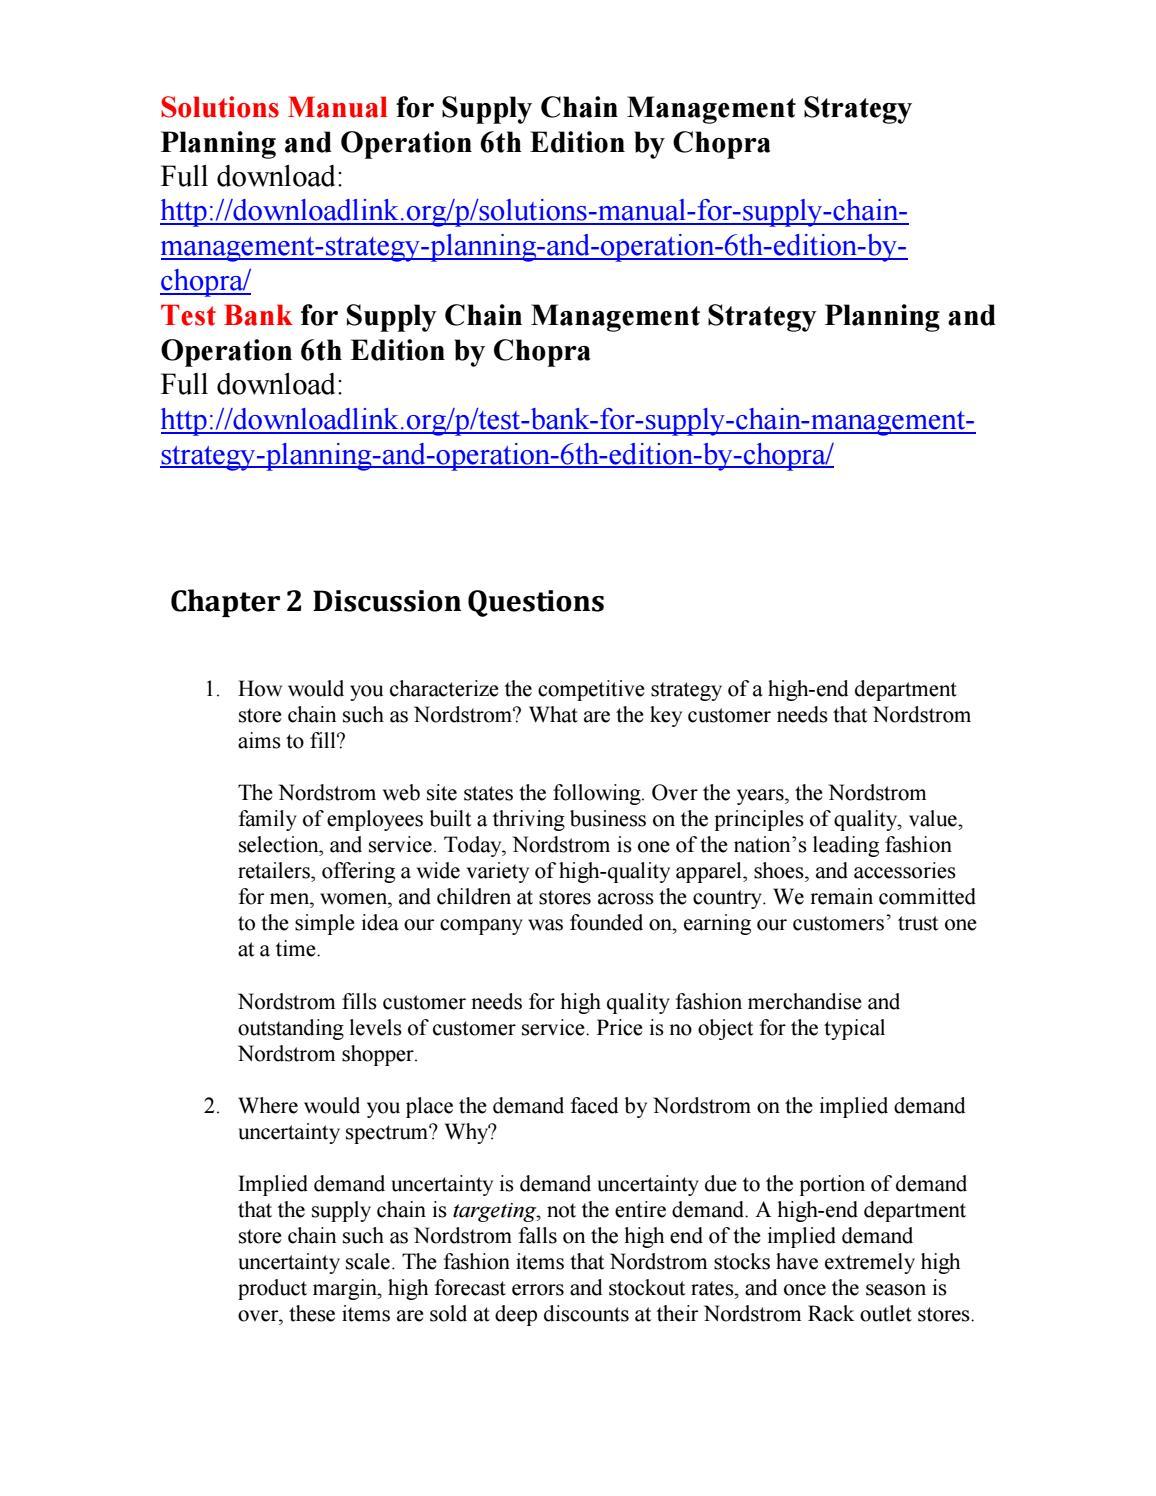 Chopra Meindl Supply Chain Management Pdf